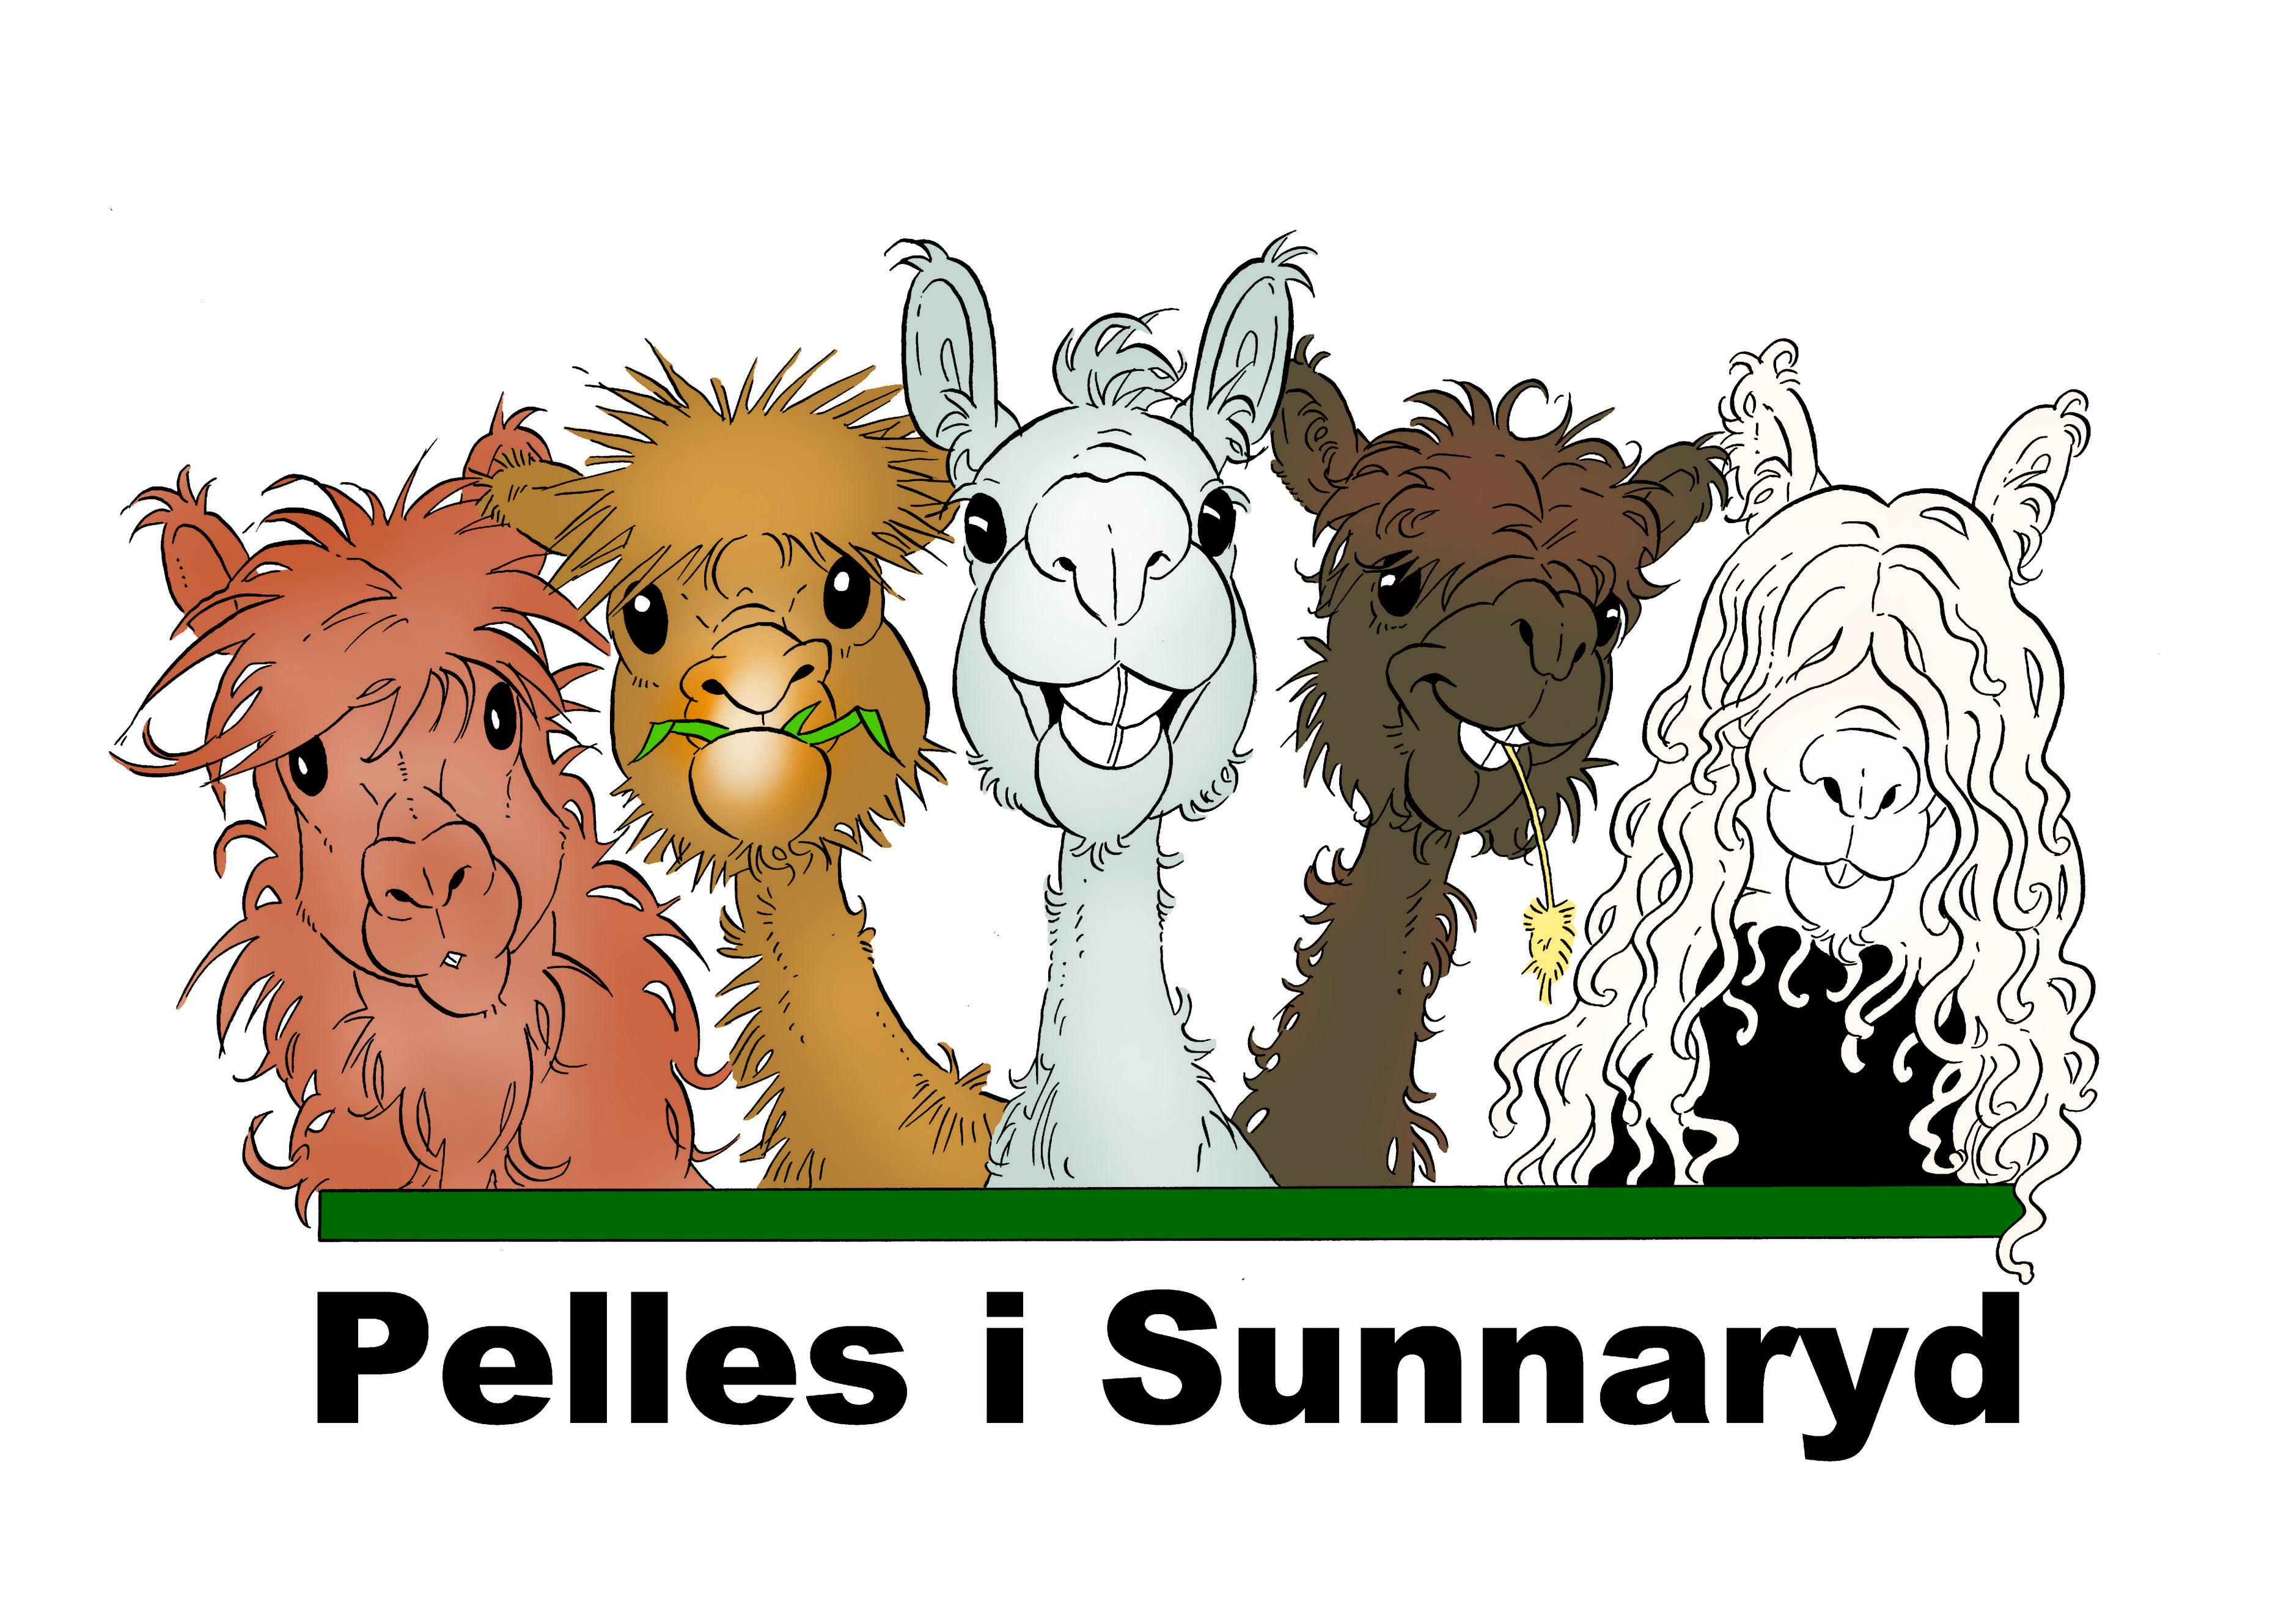 Pelles i Sunnaryd,  © Pelles i Sunnaryd, Pelles i Sunnaryd